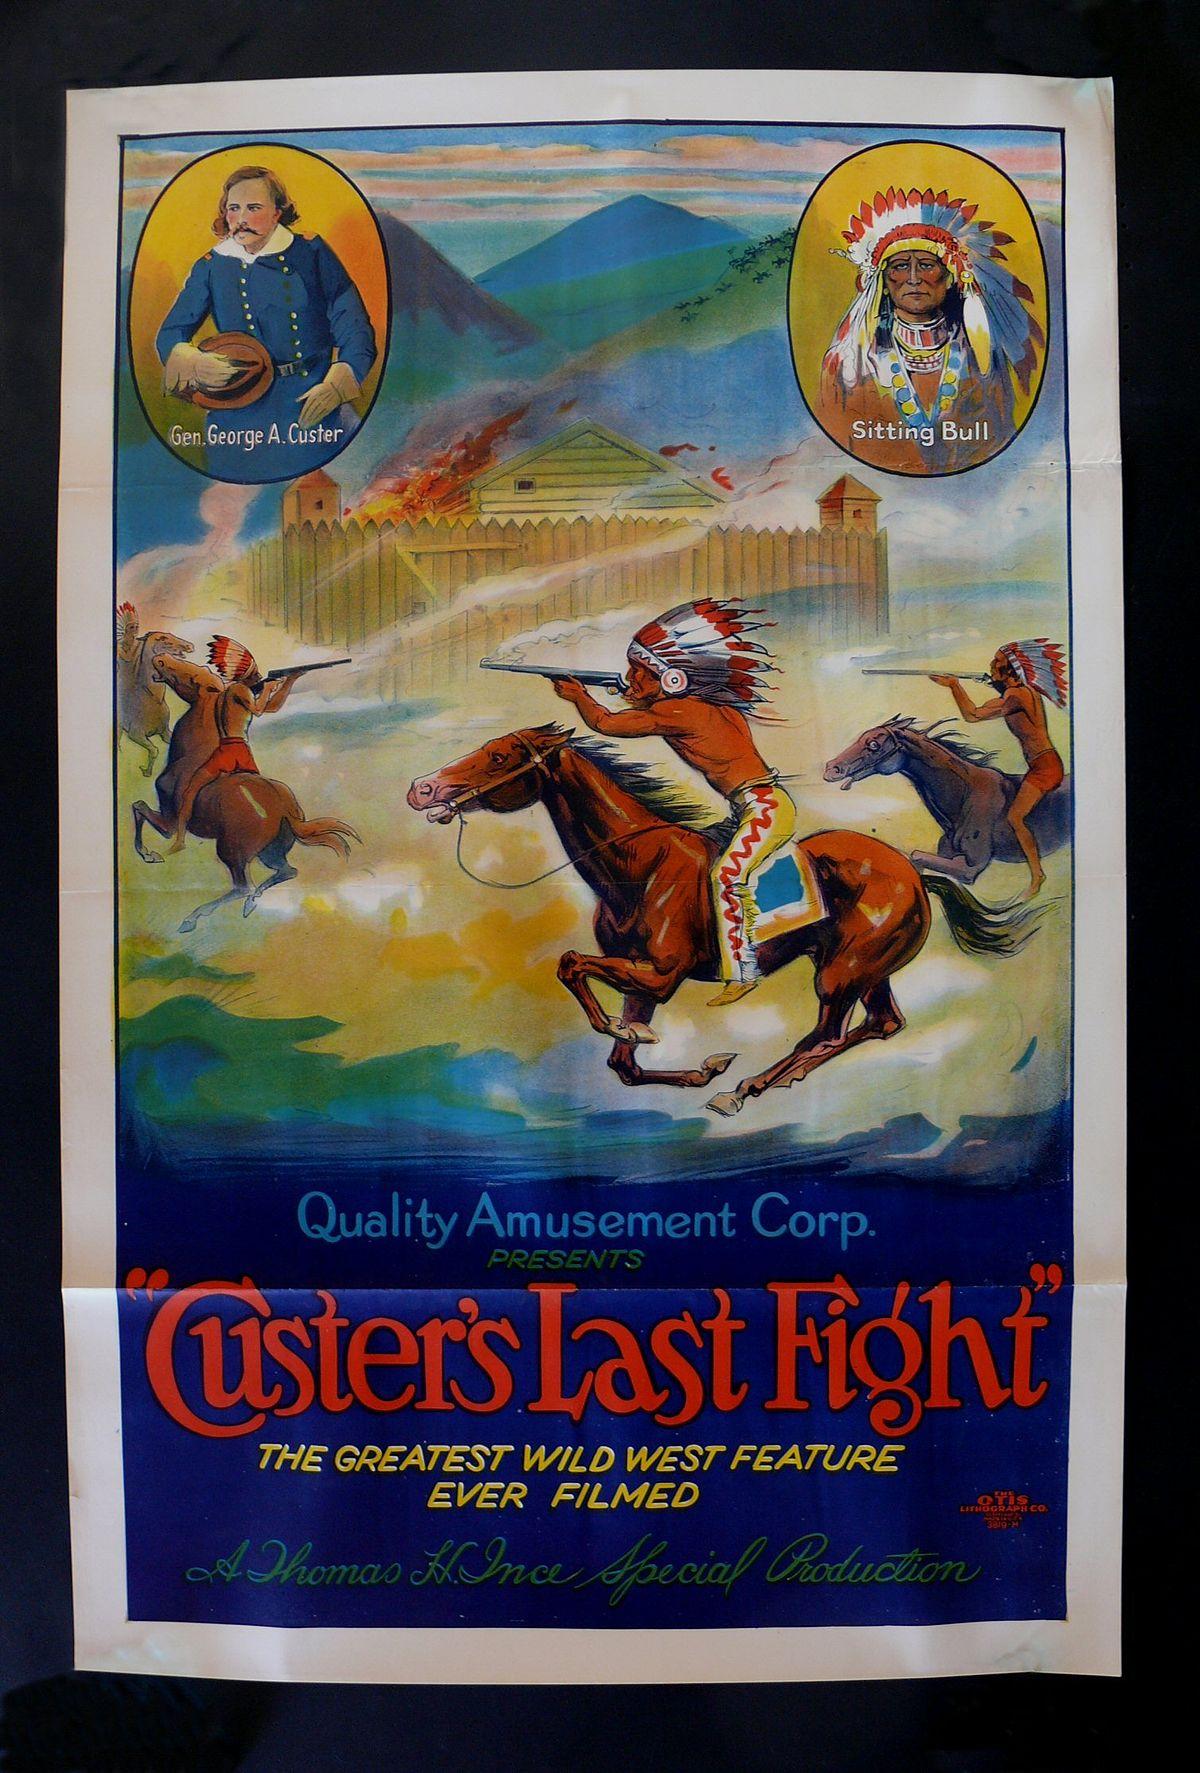 custer u0026 39 s last fight